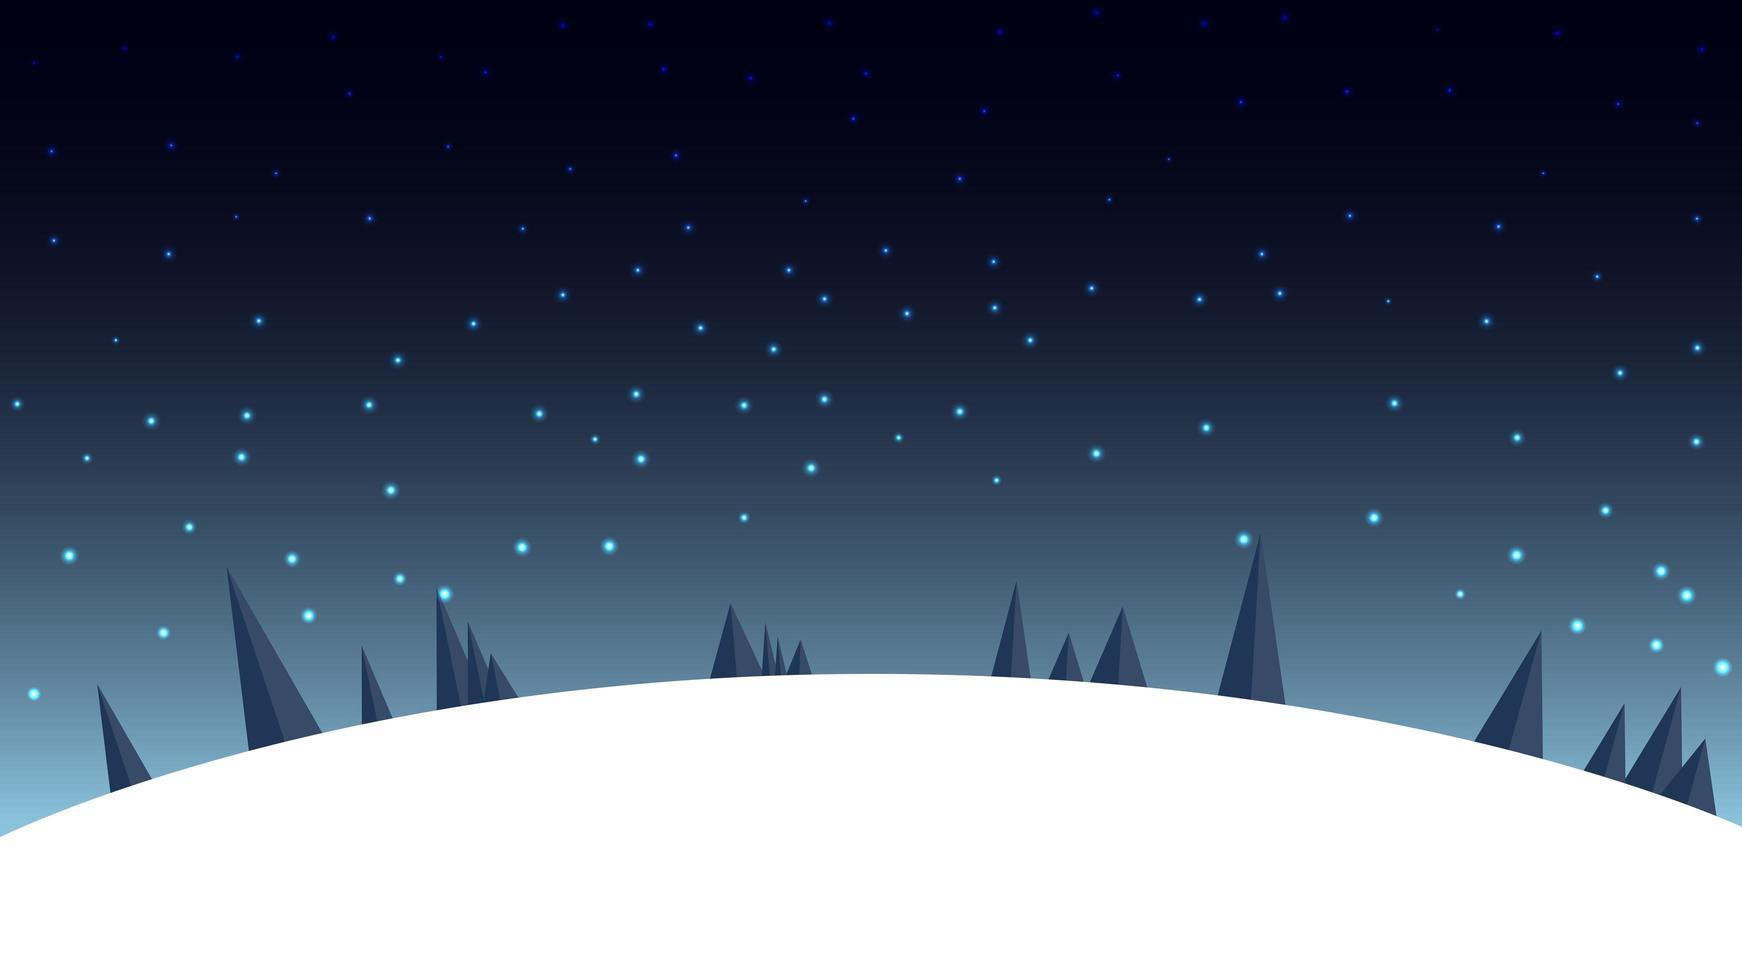 Cartoon night winter landscape with starry sky vector